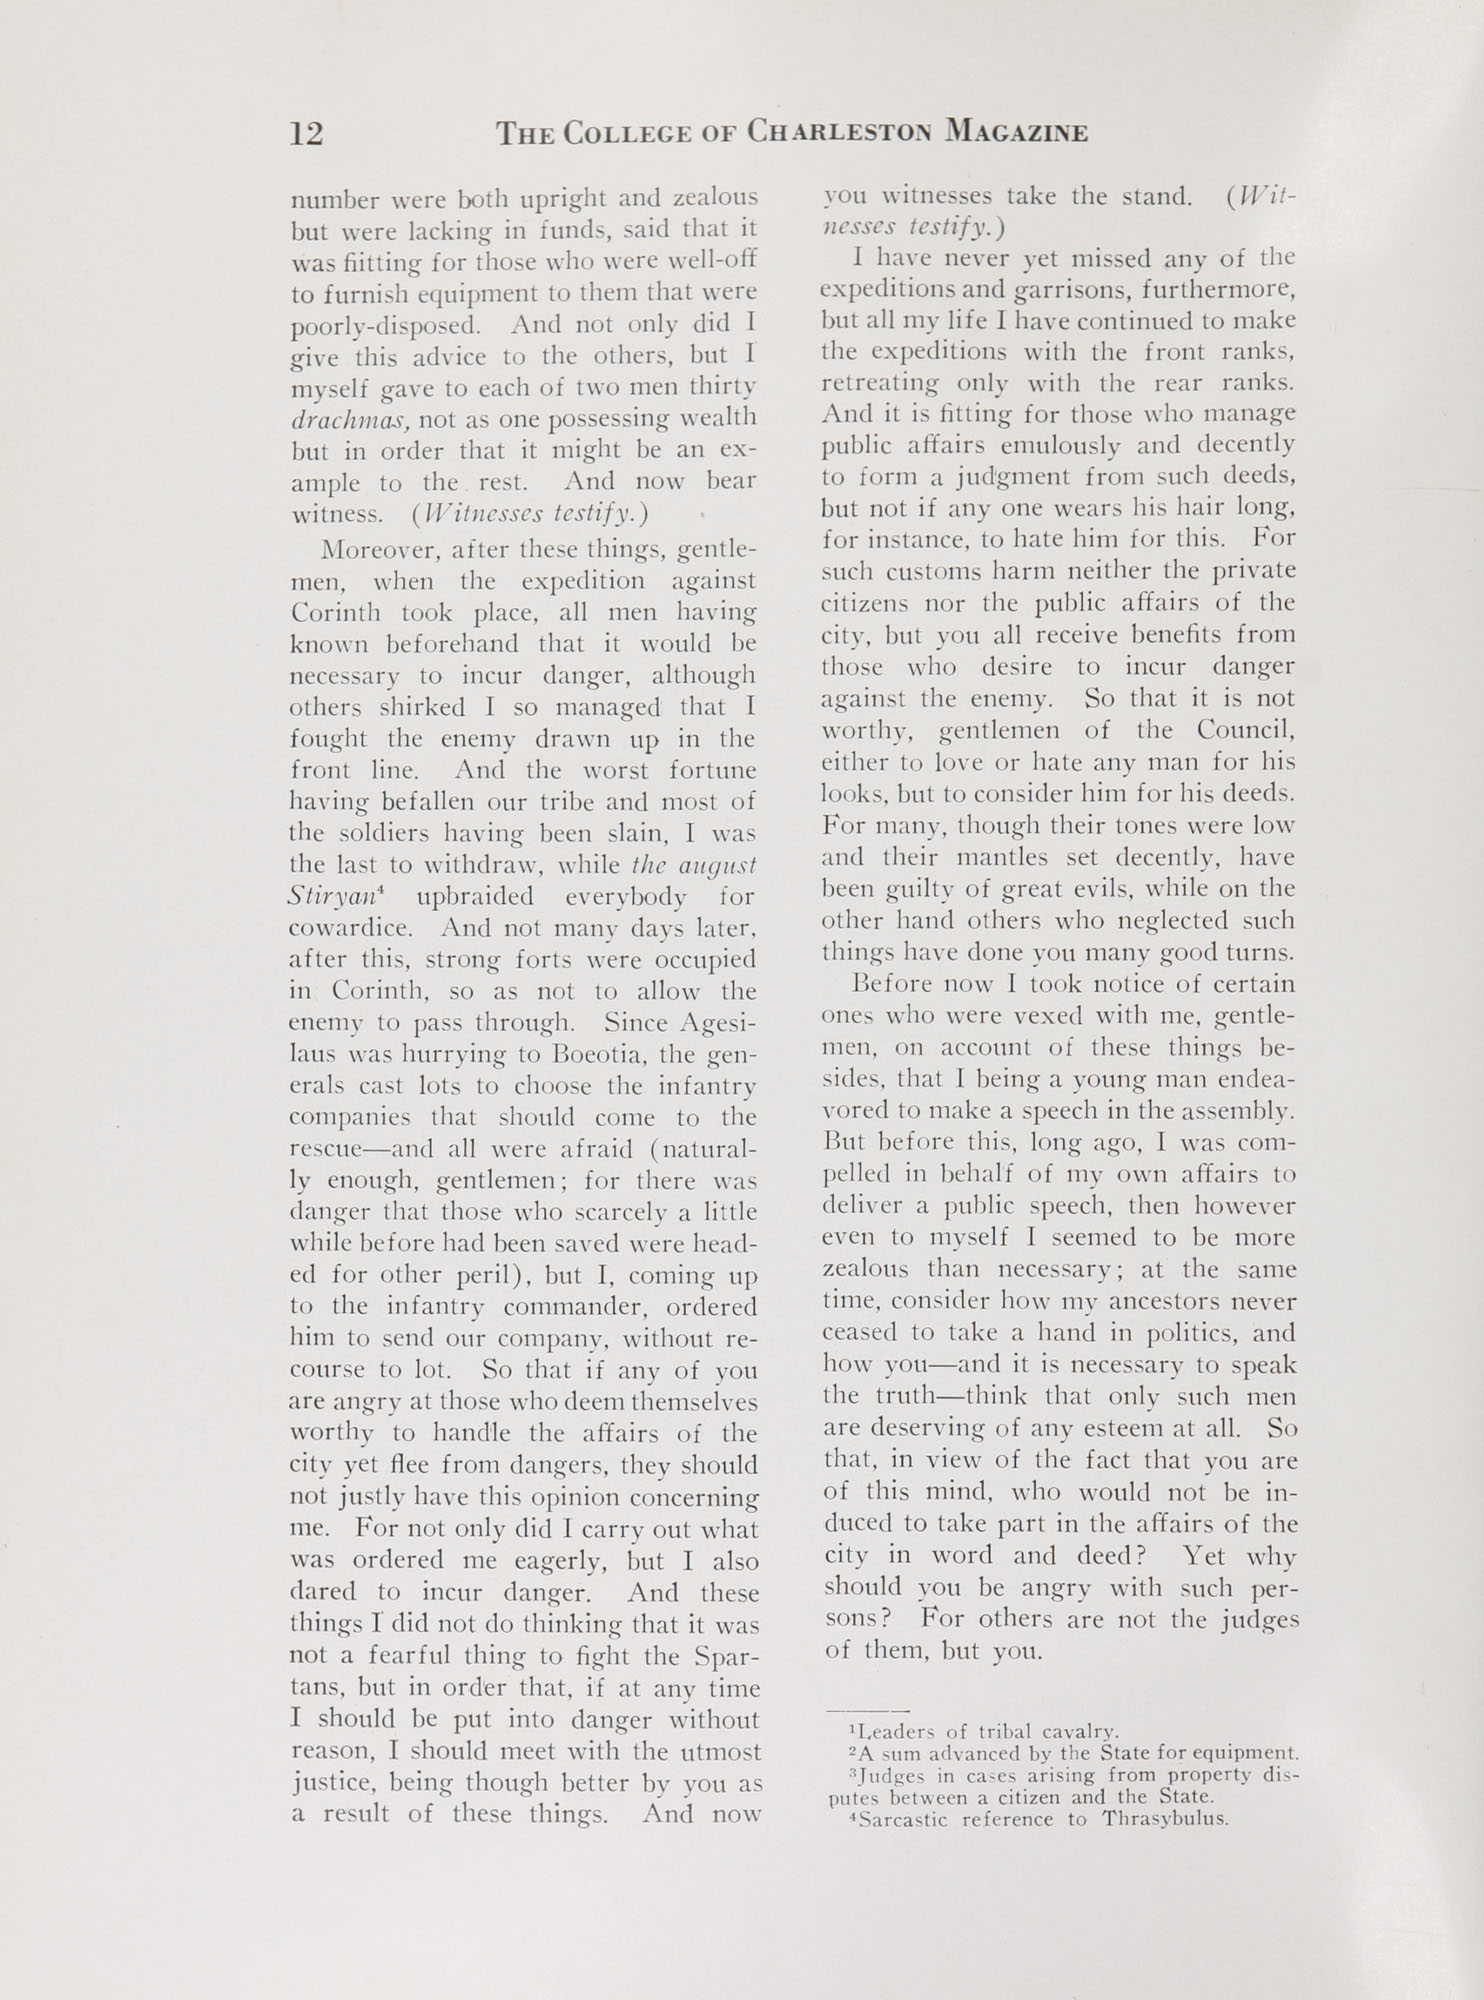 College of Charleston Magazine, 1938-1939, Vol. XXXXII No. 1, page 12